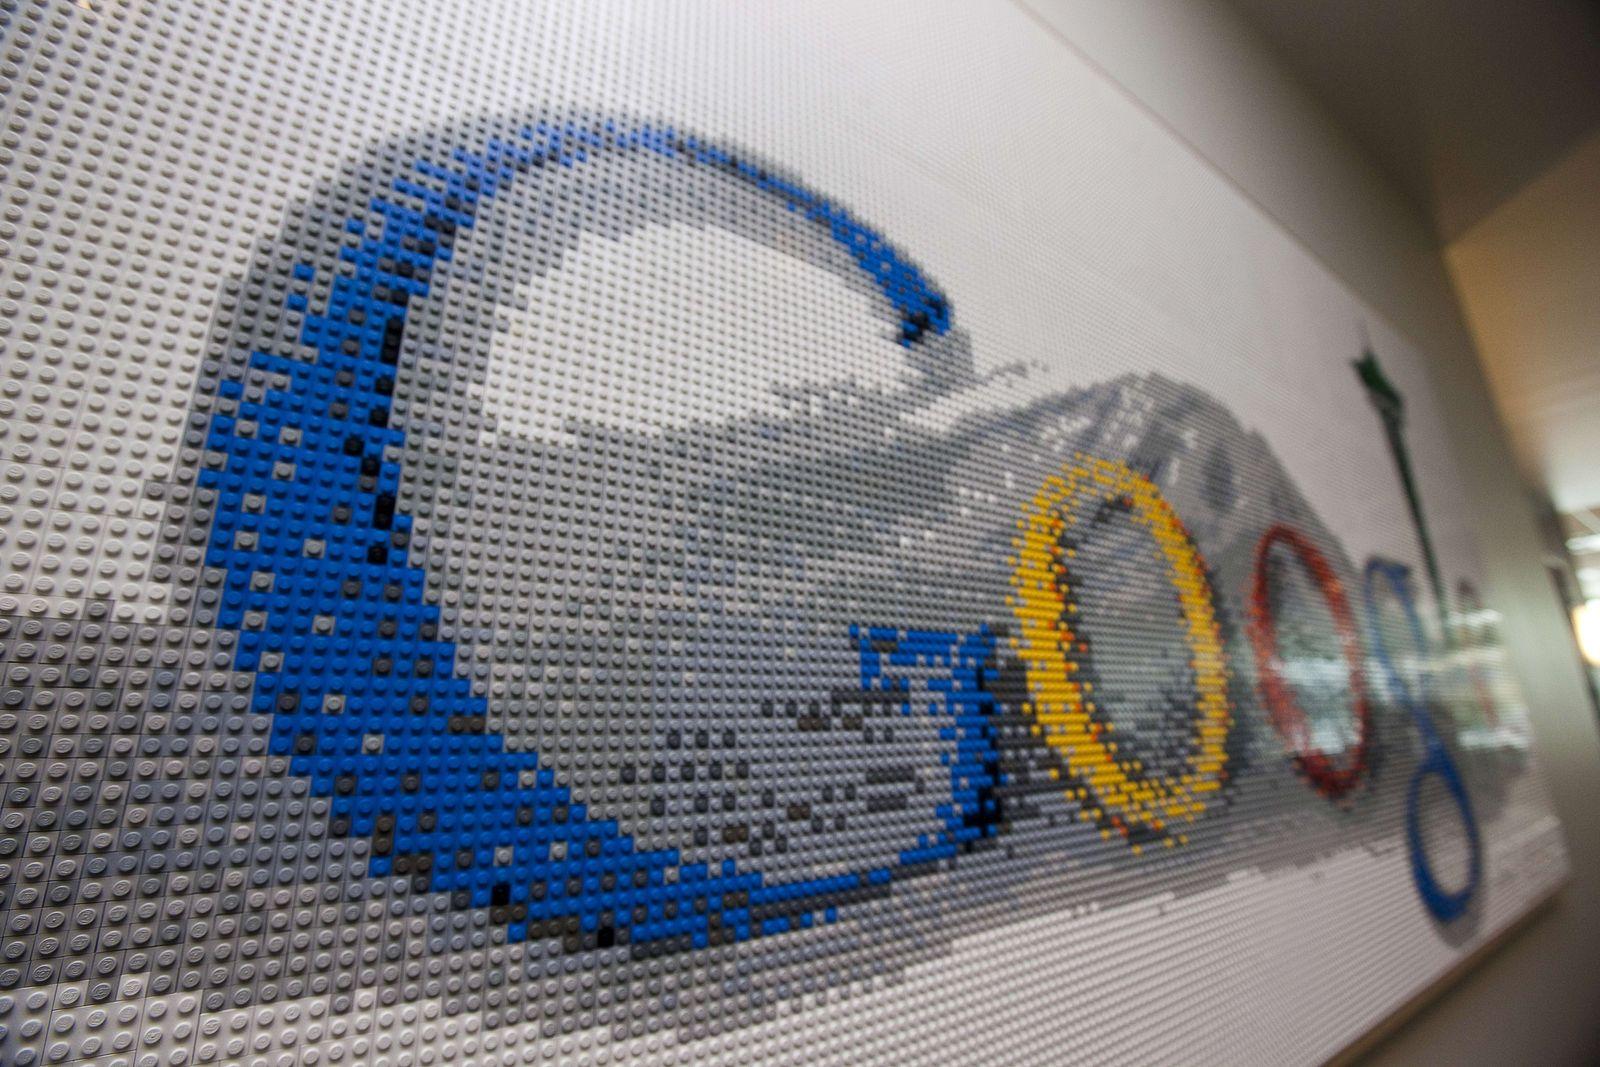 Google Moves Into New Washington Campus